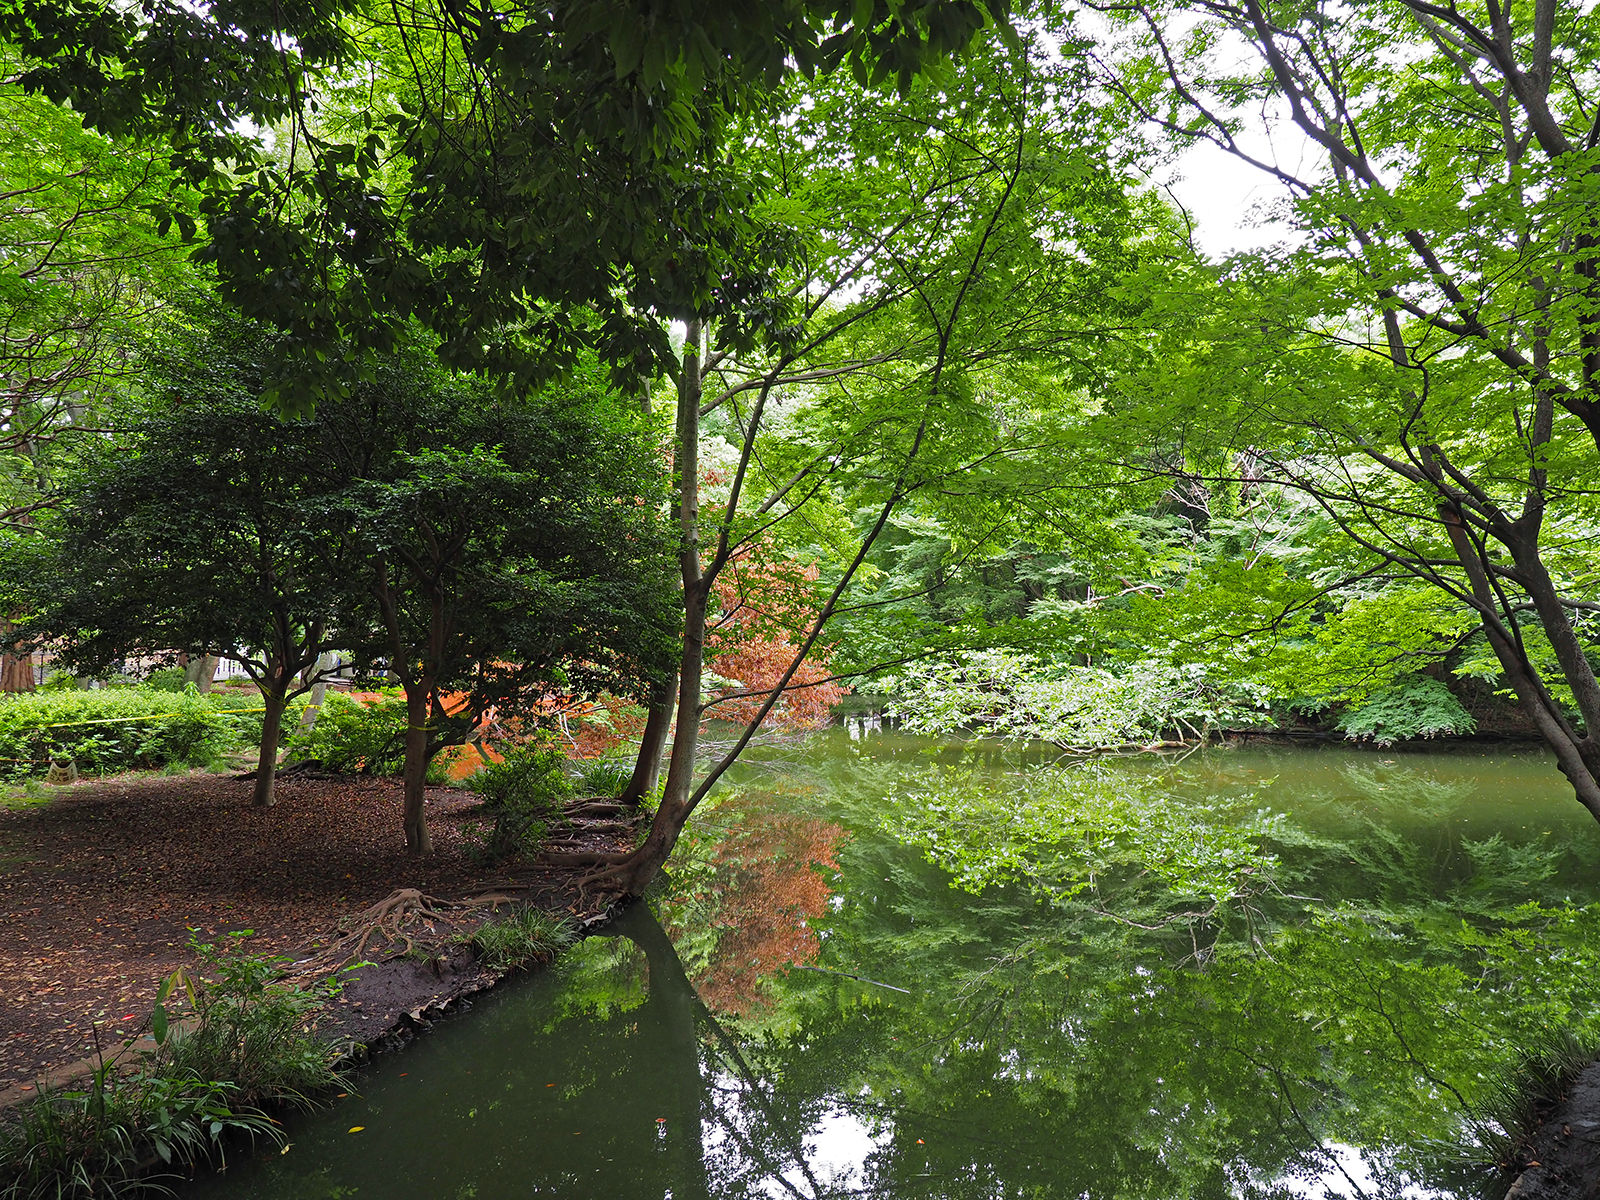 【OLYMPUS】OM-D E-M1 Mark IIで撮り歩き in 和田堀公園